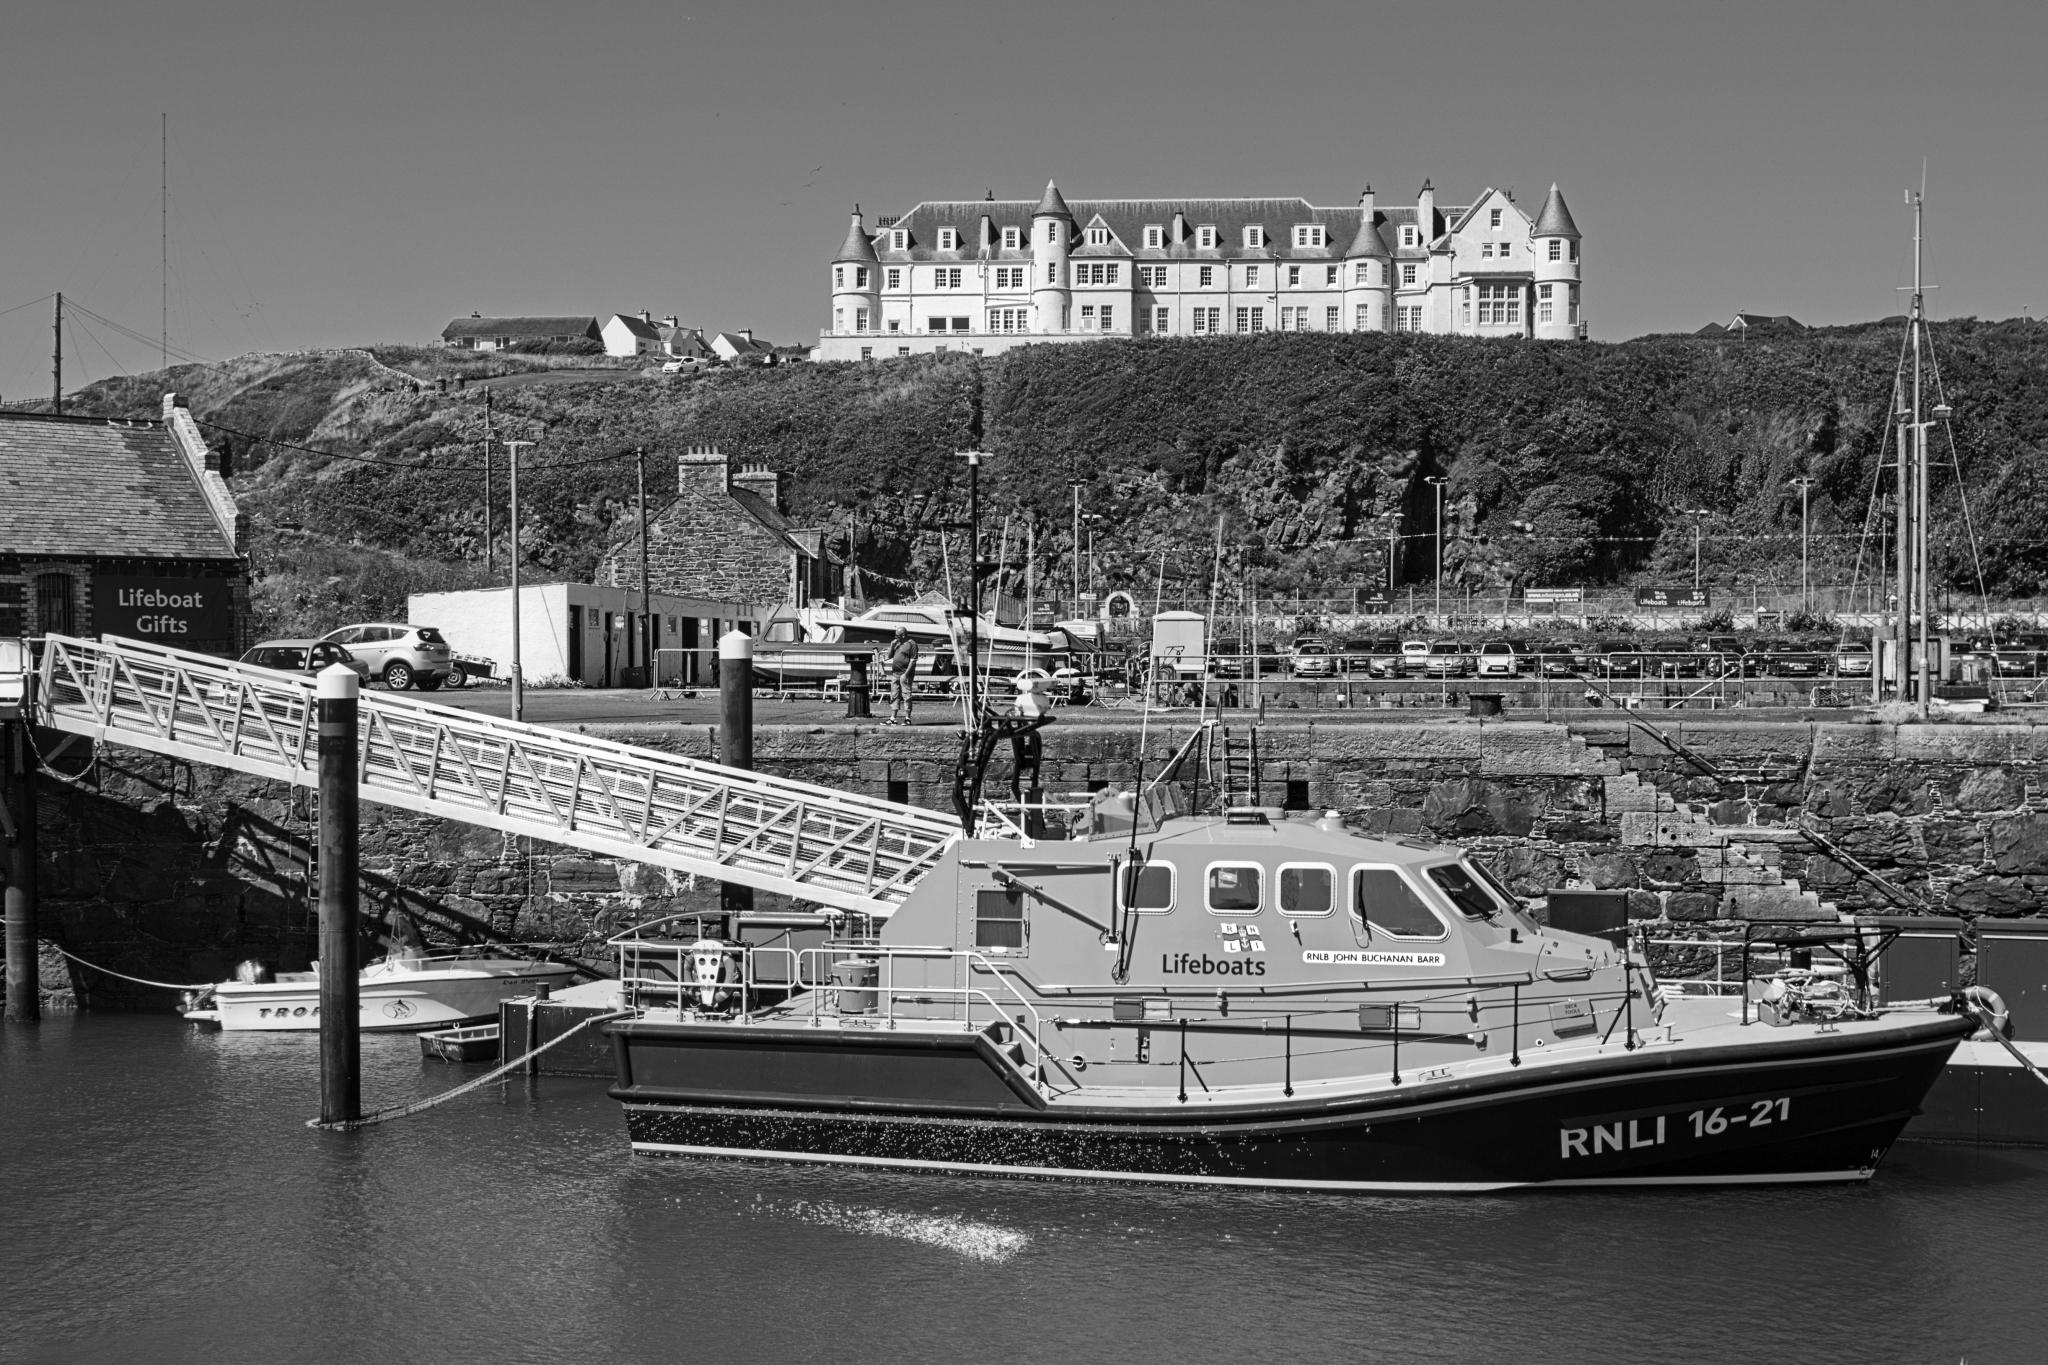 Portpatrick Lifeboat, RNLI 16-21, the RNLB John Buchannan Barr